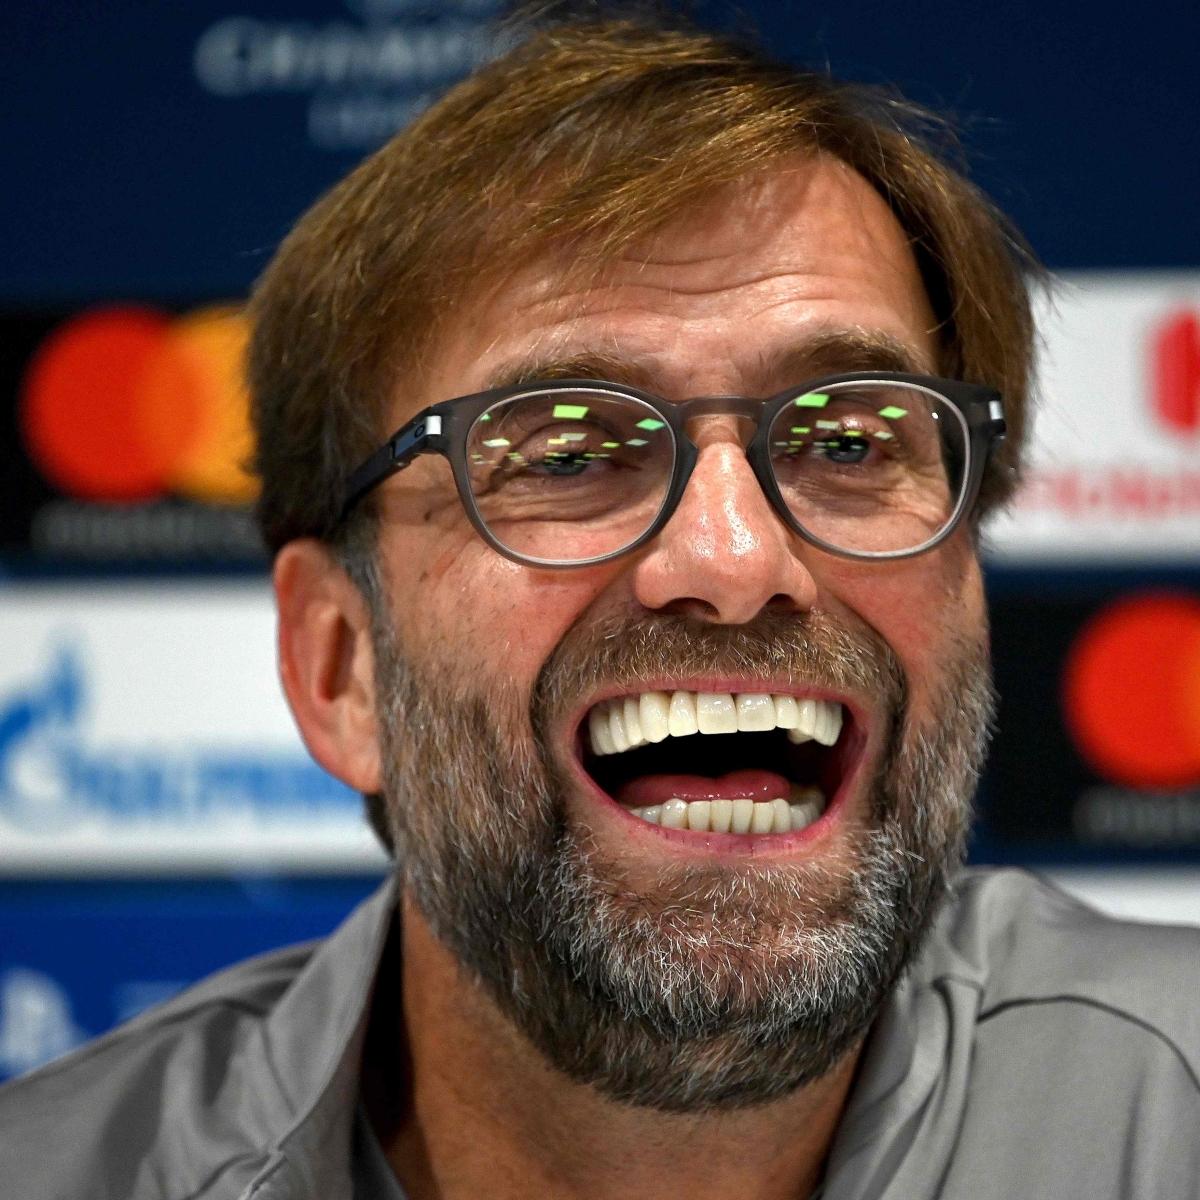 Lionel Messi or Cristiano Ronaldo? Liverpool manager Jurgen Klopp has chosen his G.O.A.T